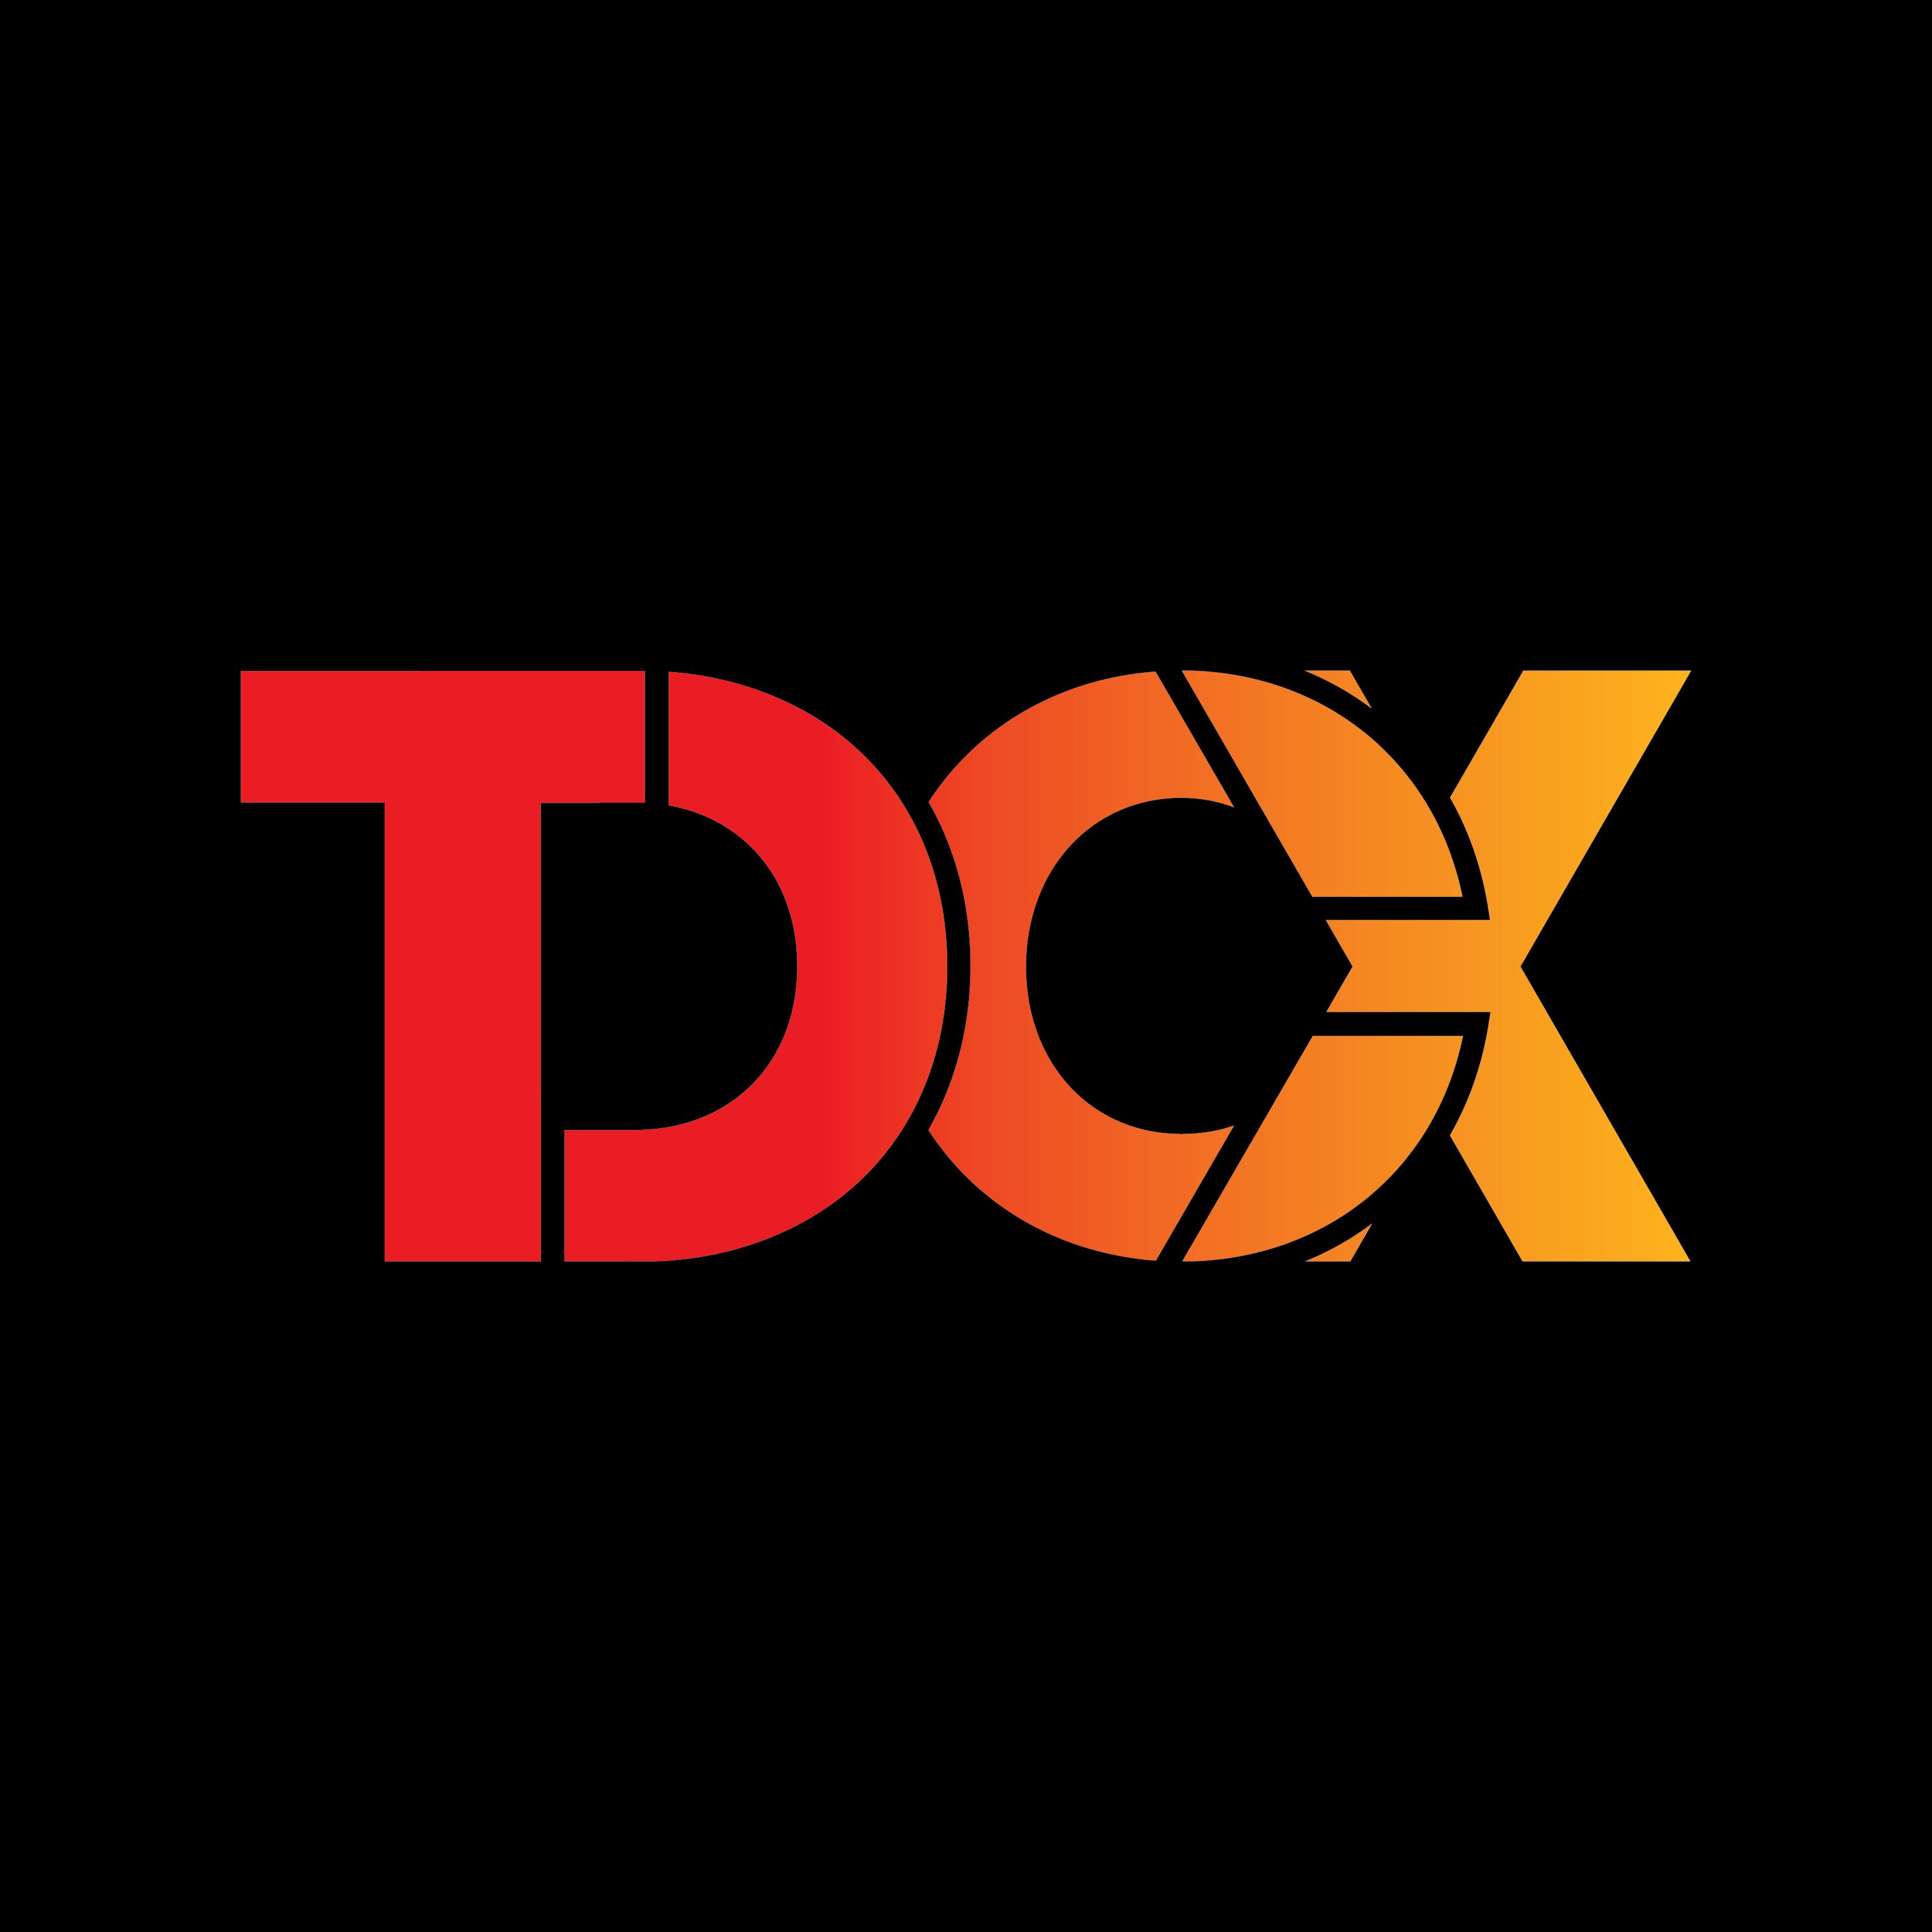 gtimedia-gradmalaysia-TDCX-Logo-2019.png